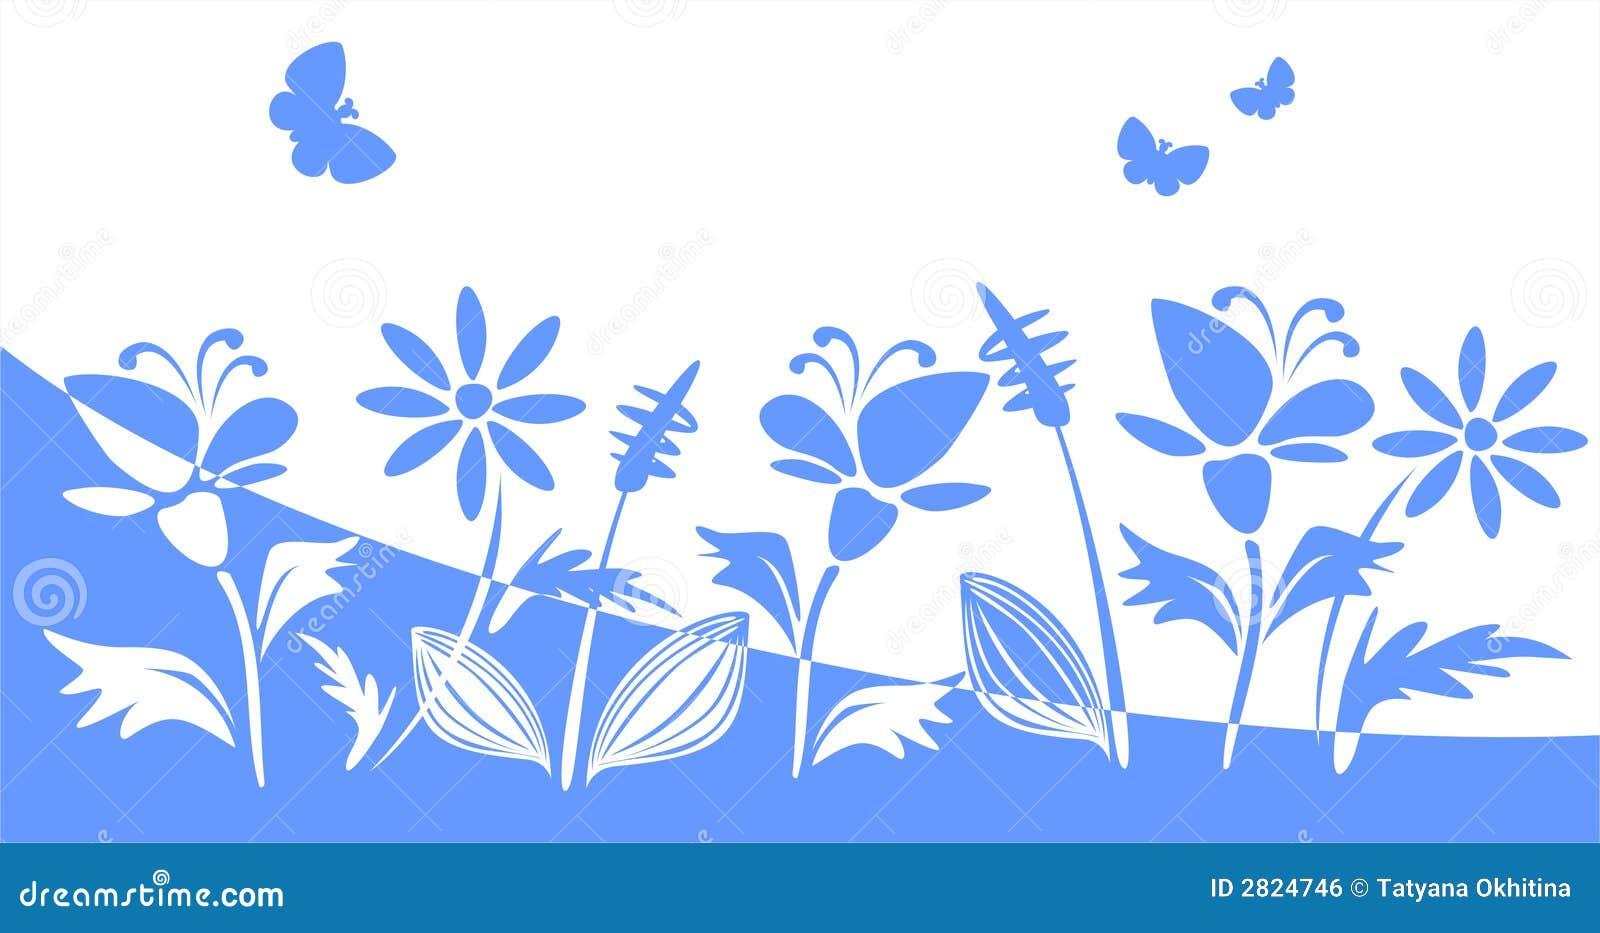 Blue flower silhouettes